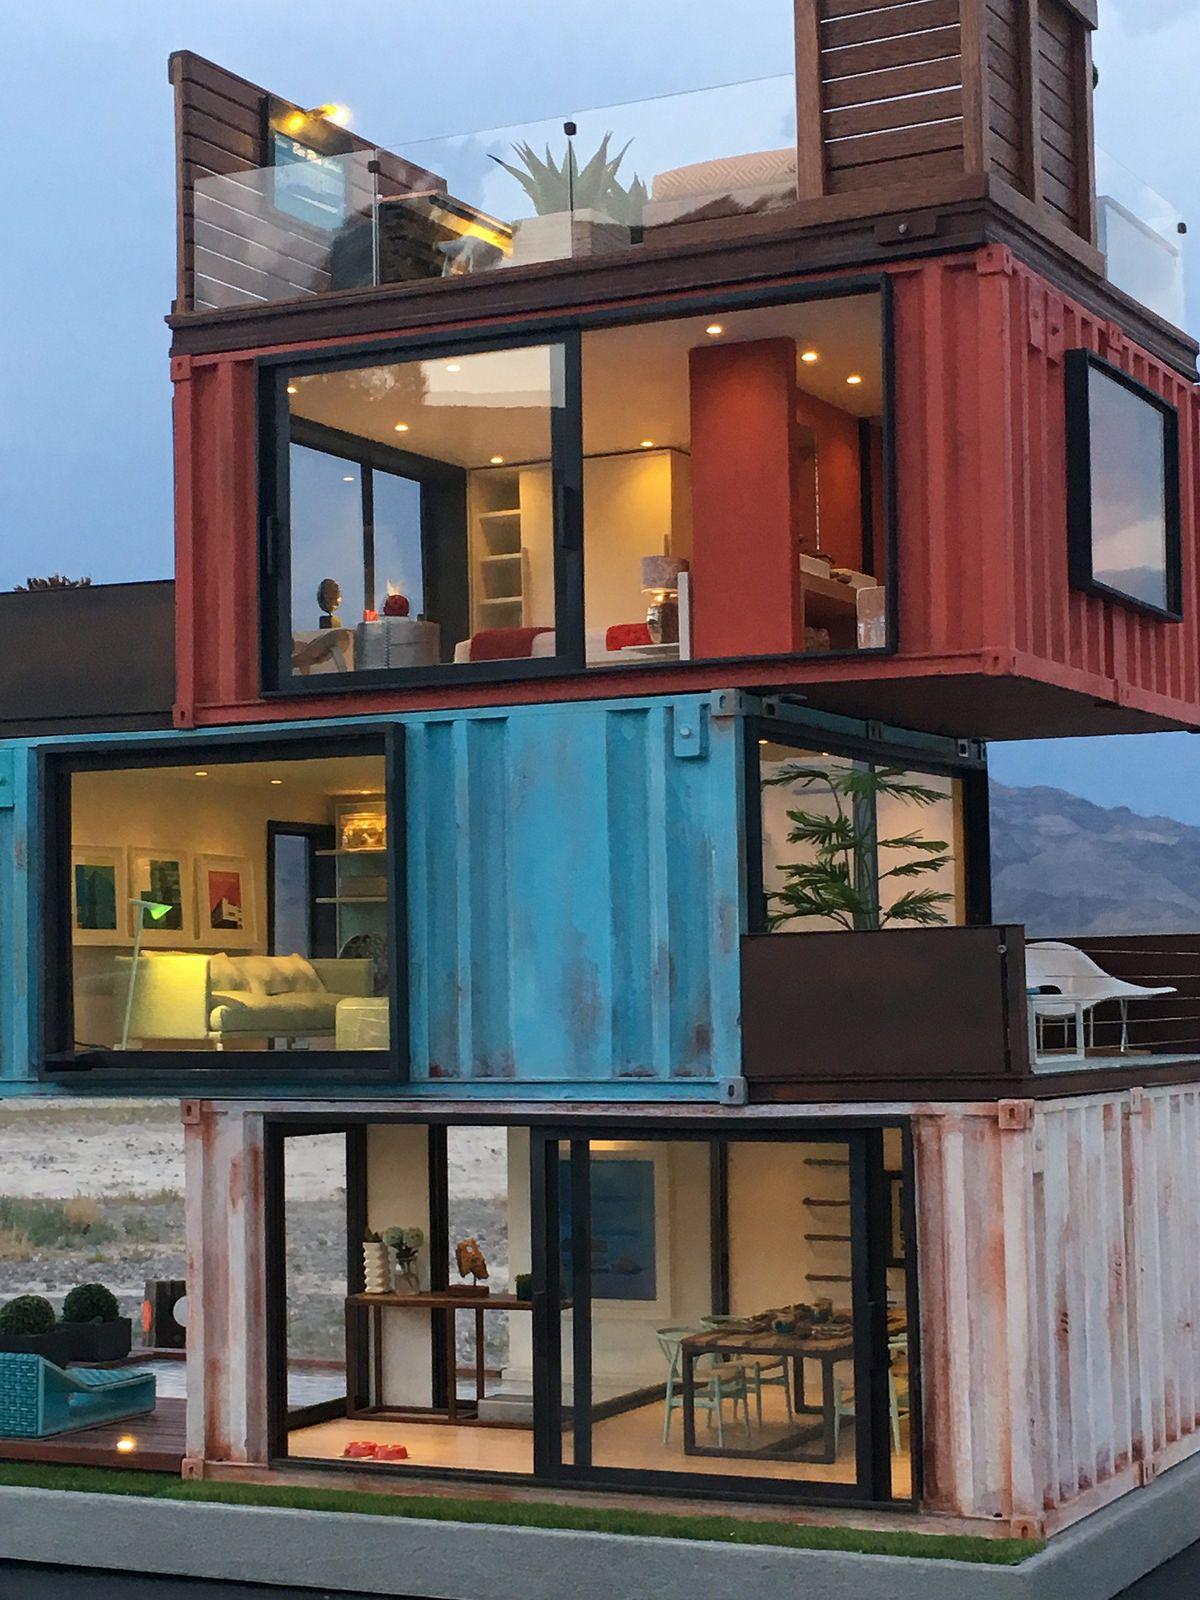 Casa de madrid a residence case study of cargotecture in - Casas prefabricadas contenedores ...